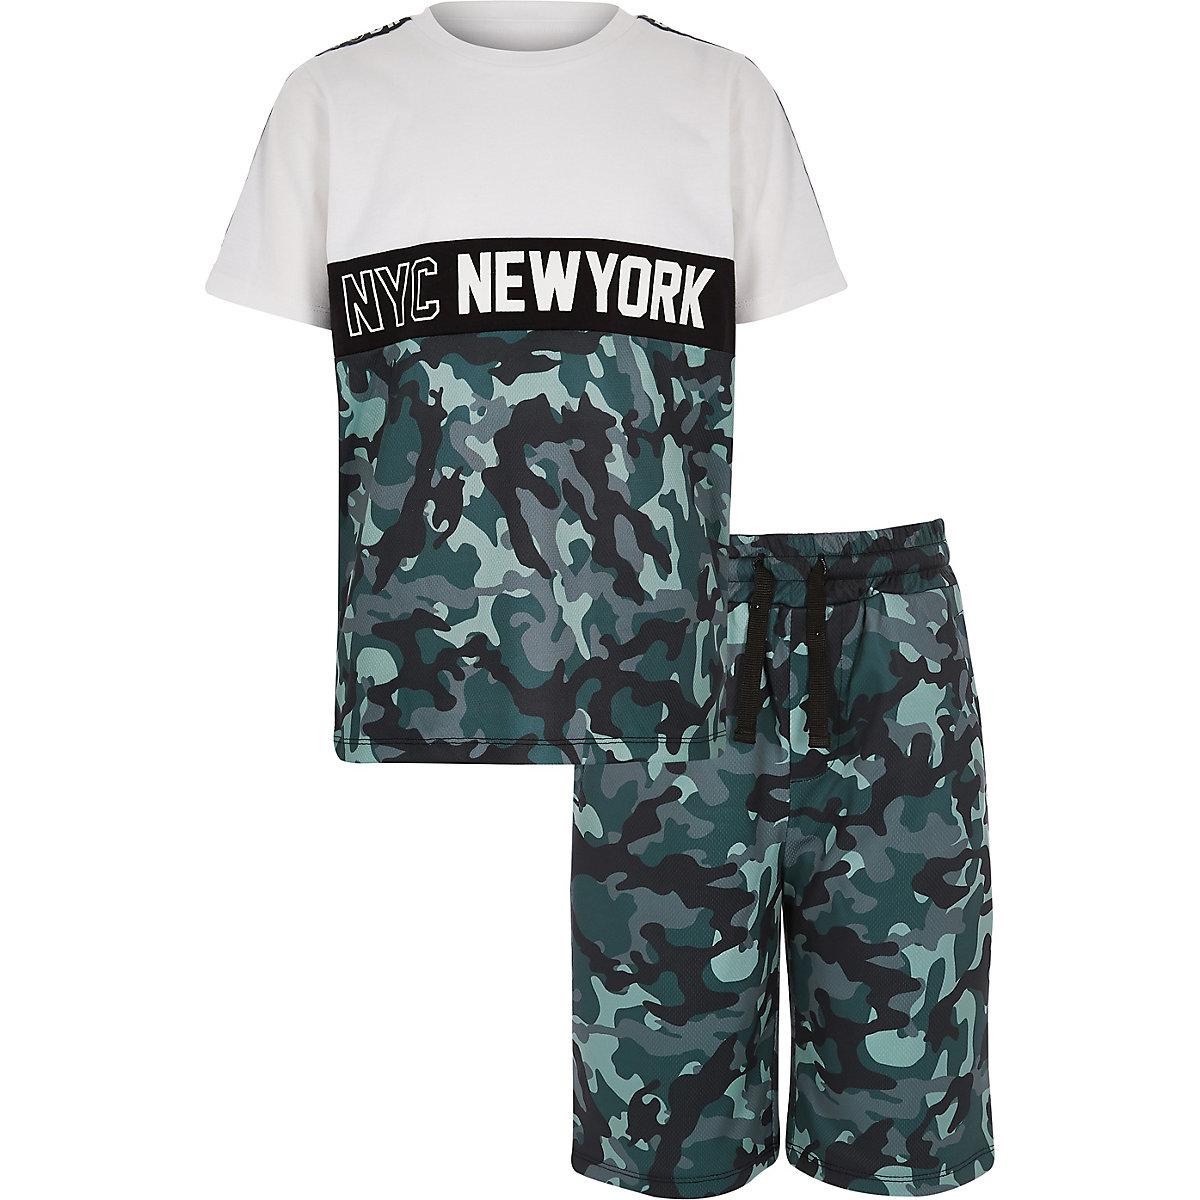 Boys white camo mesh T-shirt outfit